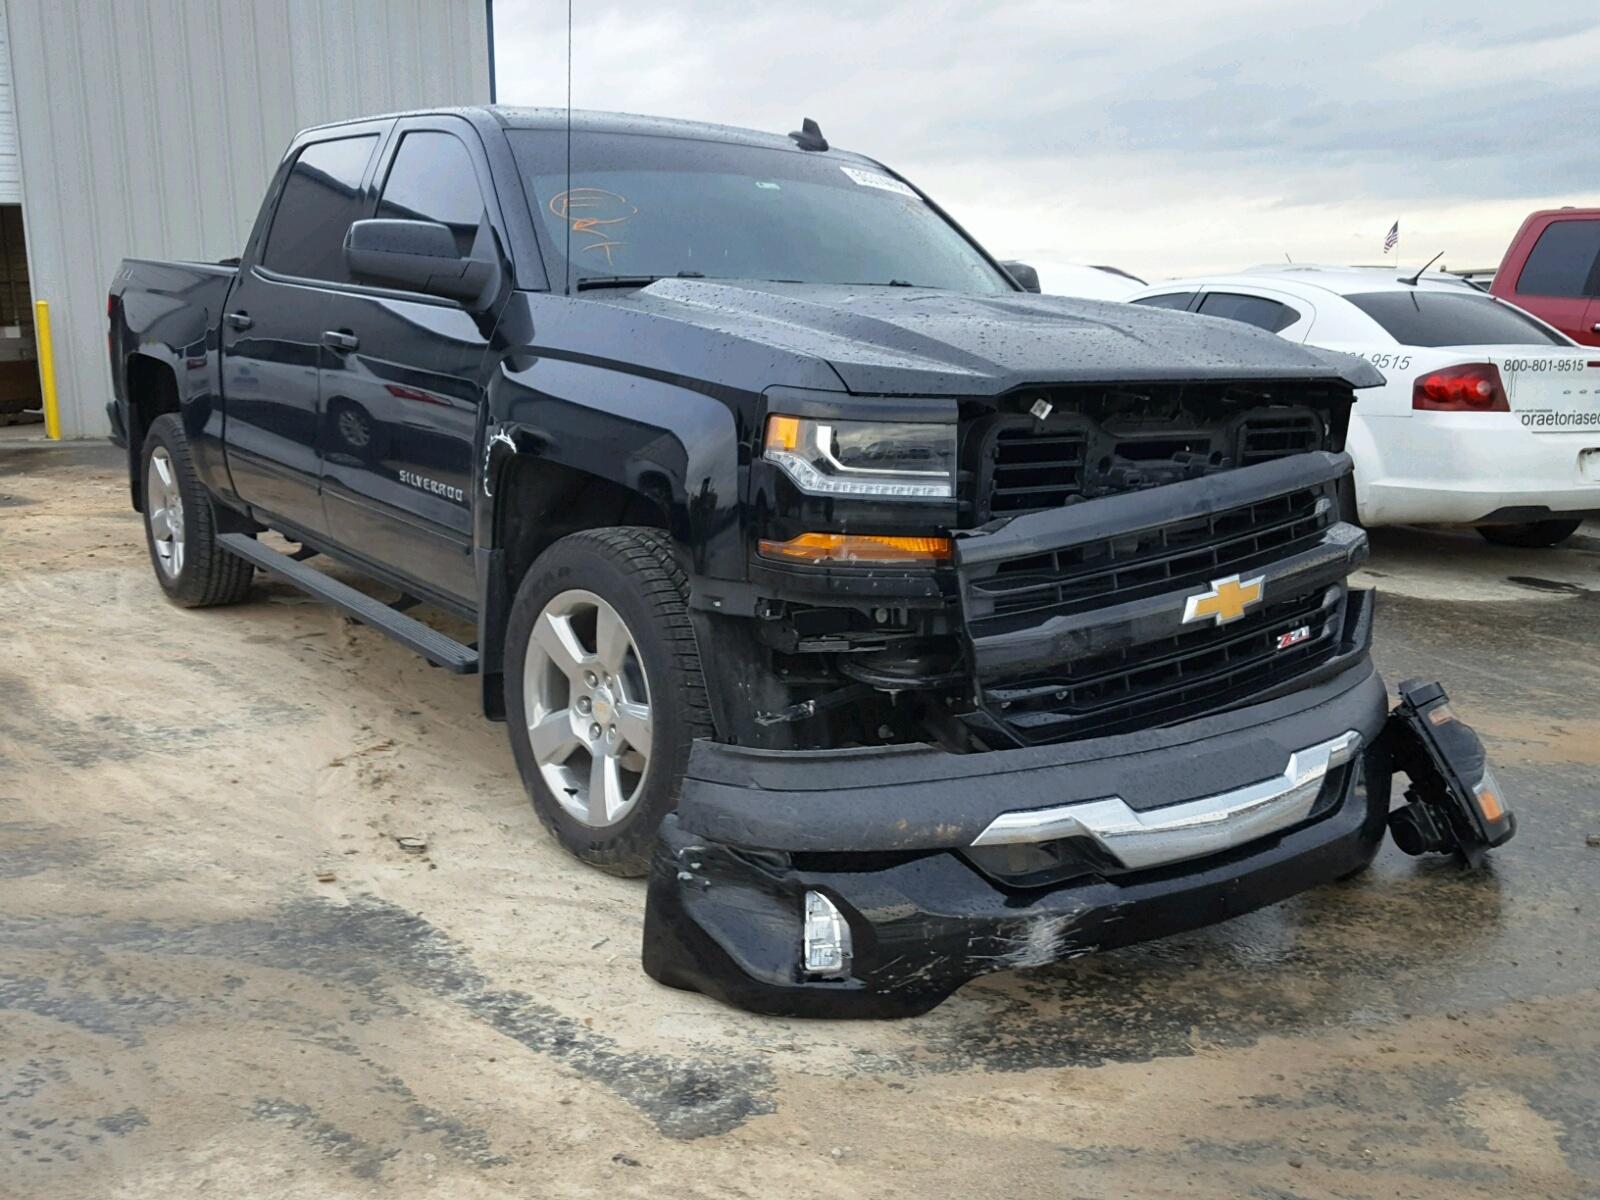 wrecked trucks silverado salvage cars chevrolet